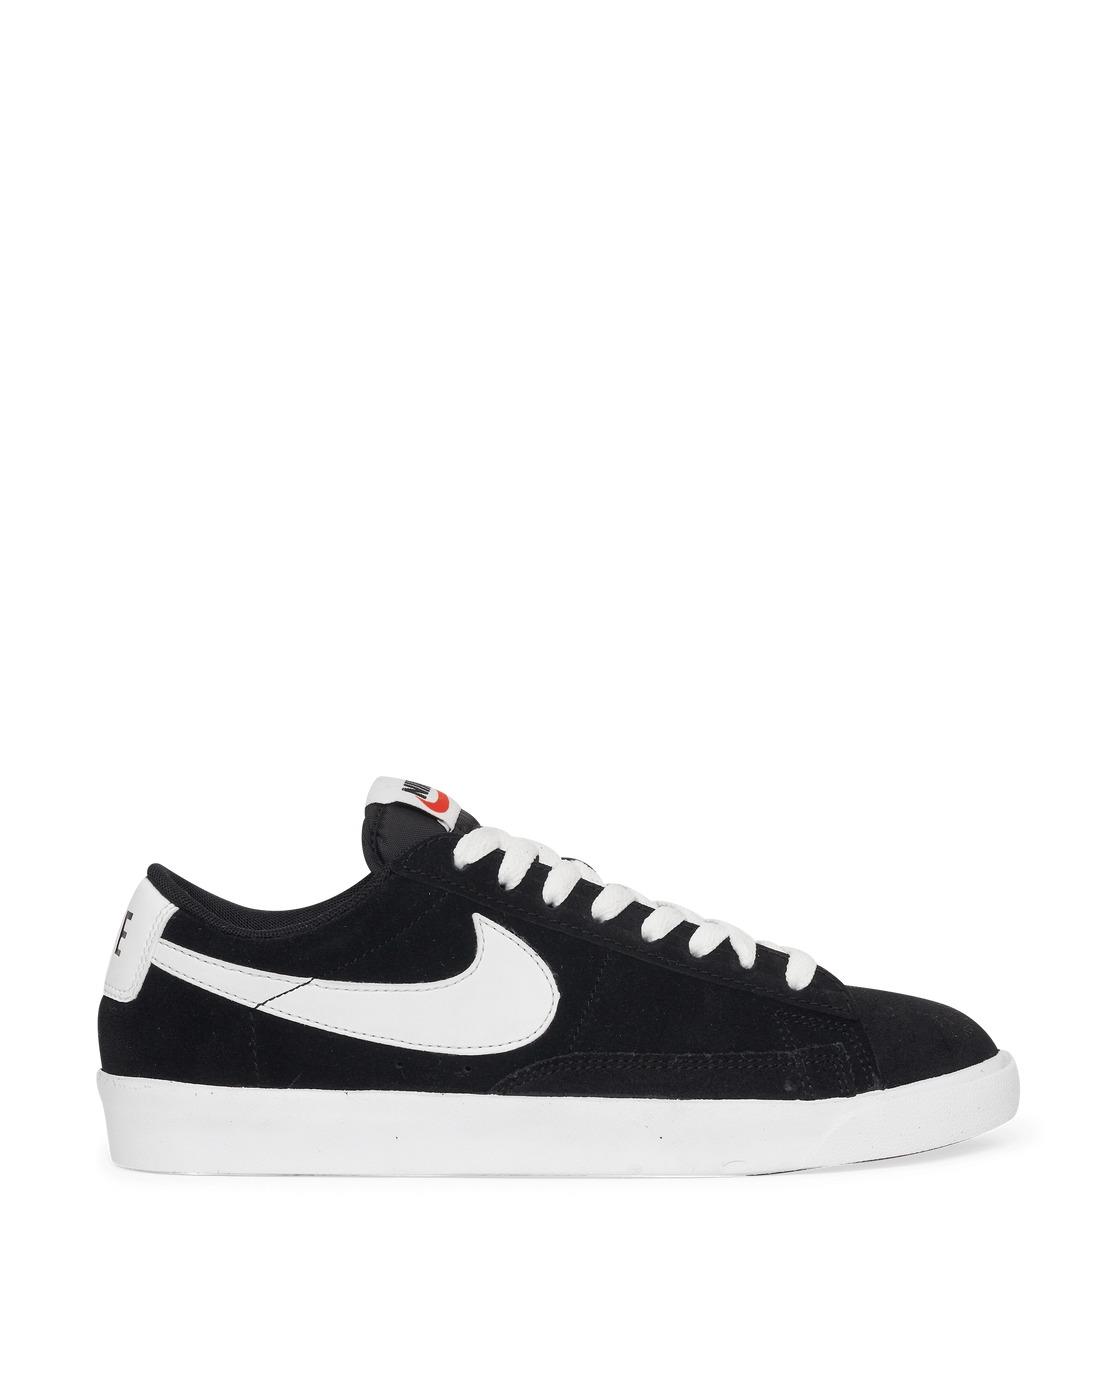 Nike Blazer Low Premium Vintage Suede Sneakers Black/White Nike